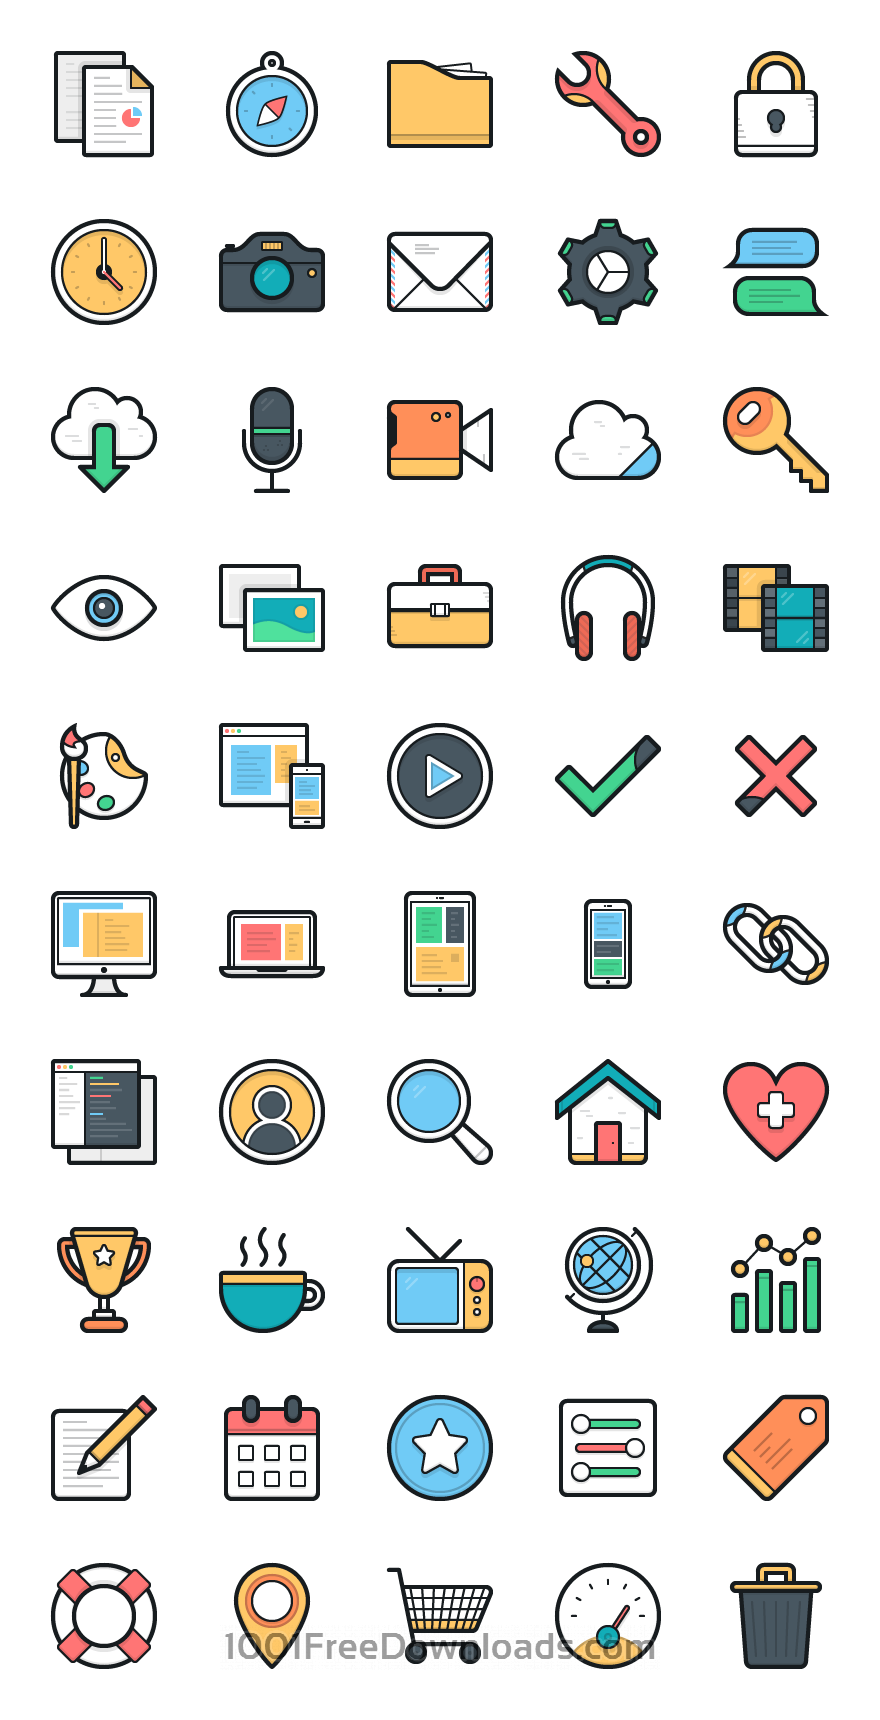 Free Vectors Lulu Icons Set 1 Various Icons Personal Bussines Cards Icones Instagram Histoire Instagram Autocollants Imprimables Gratuits